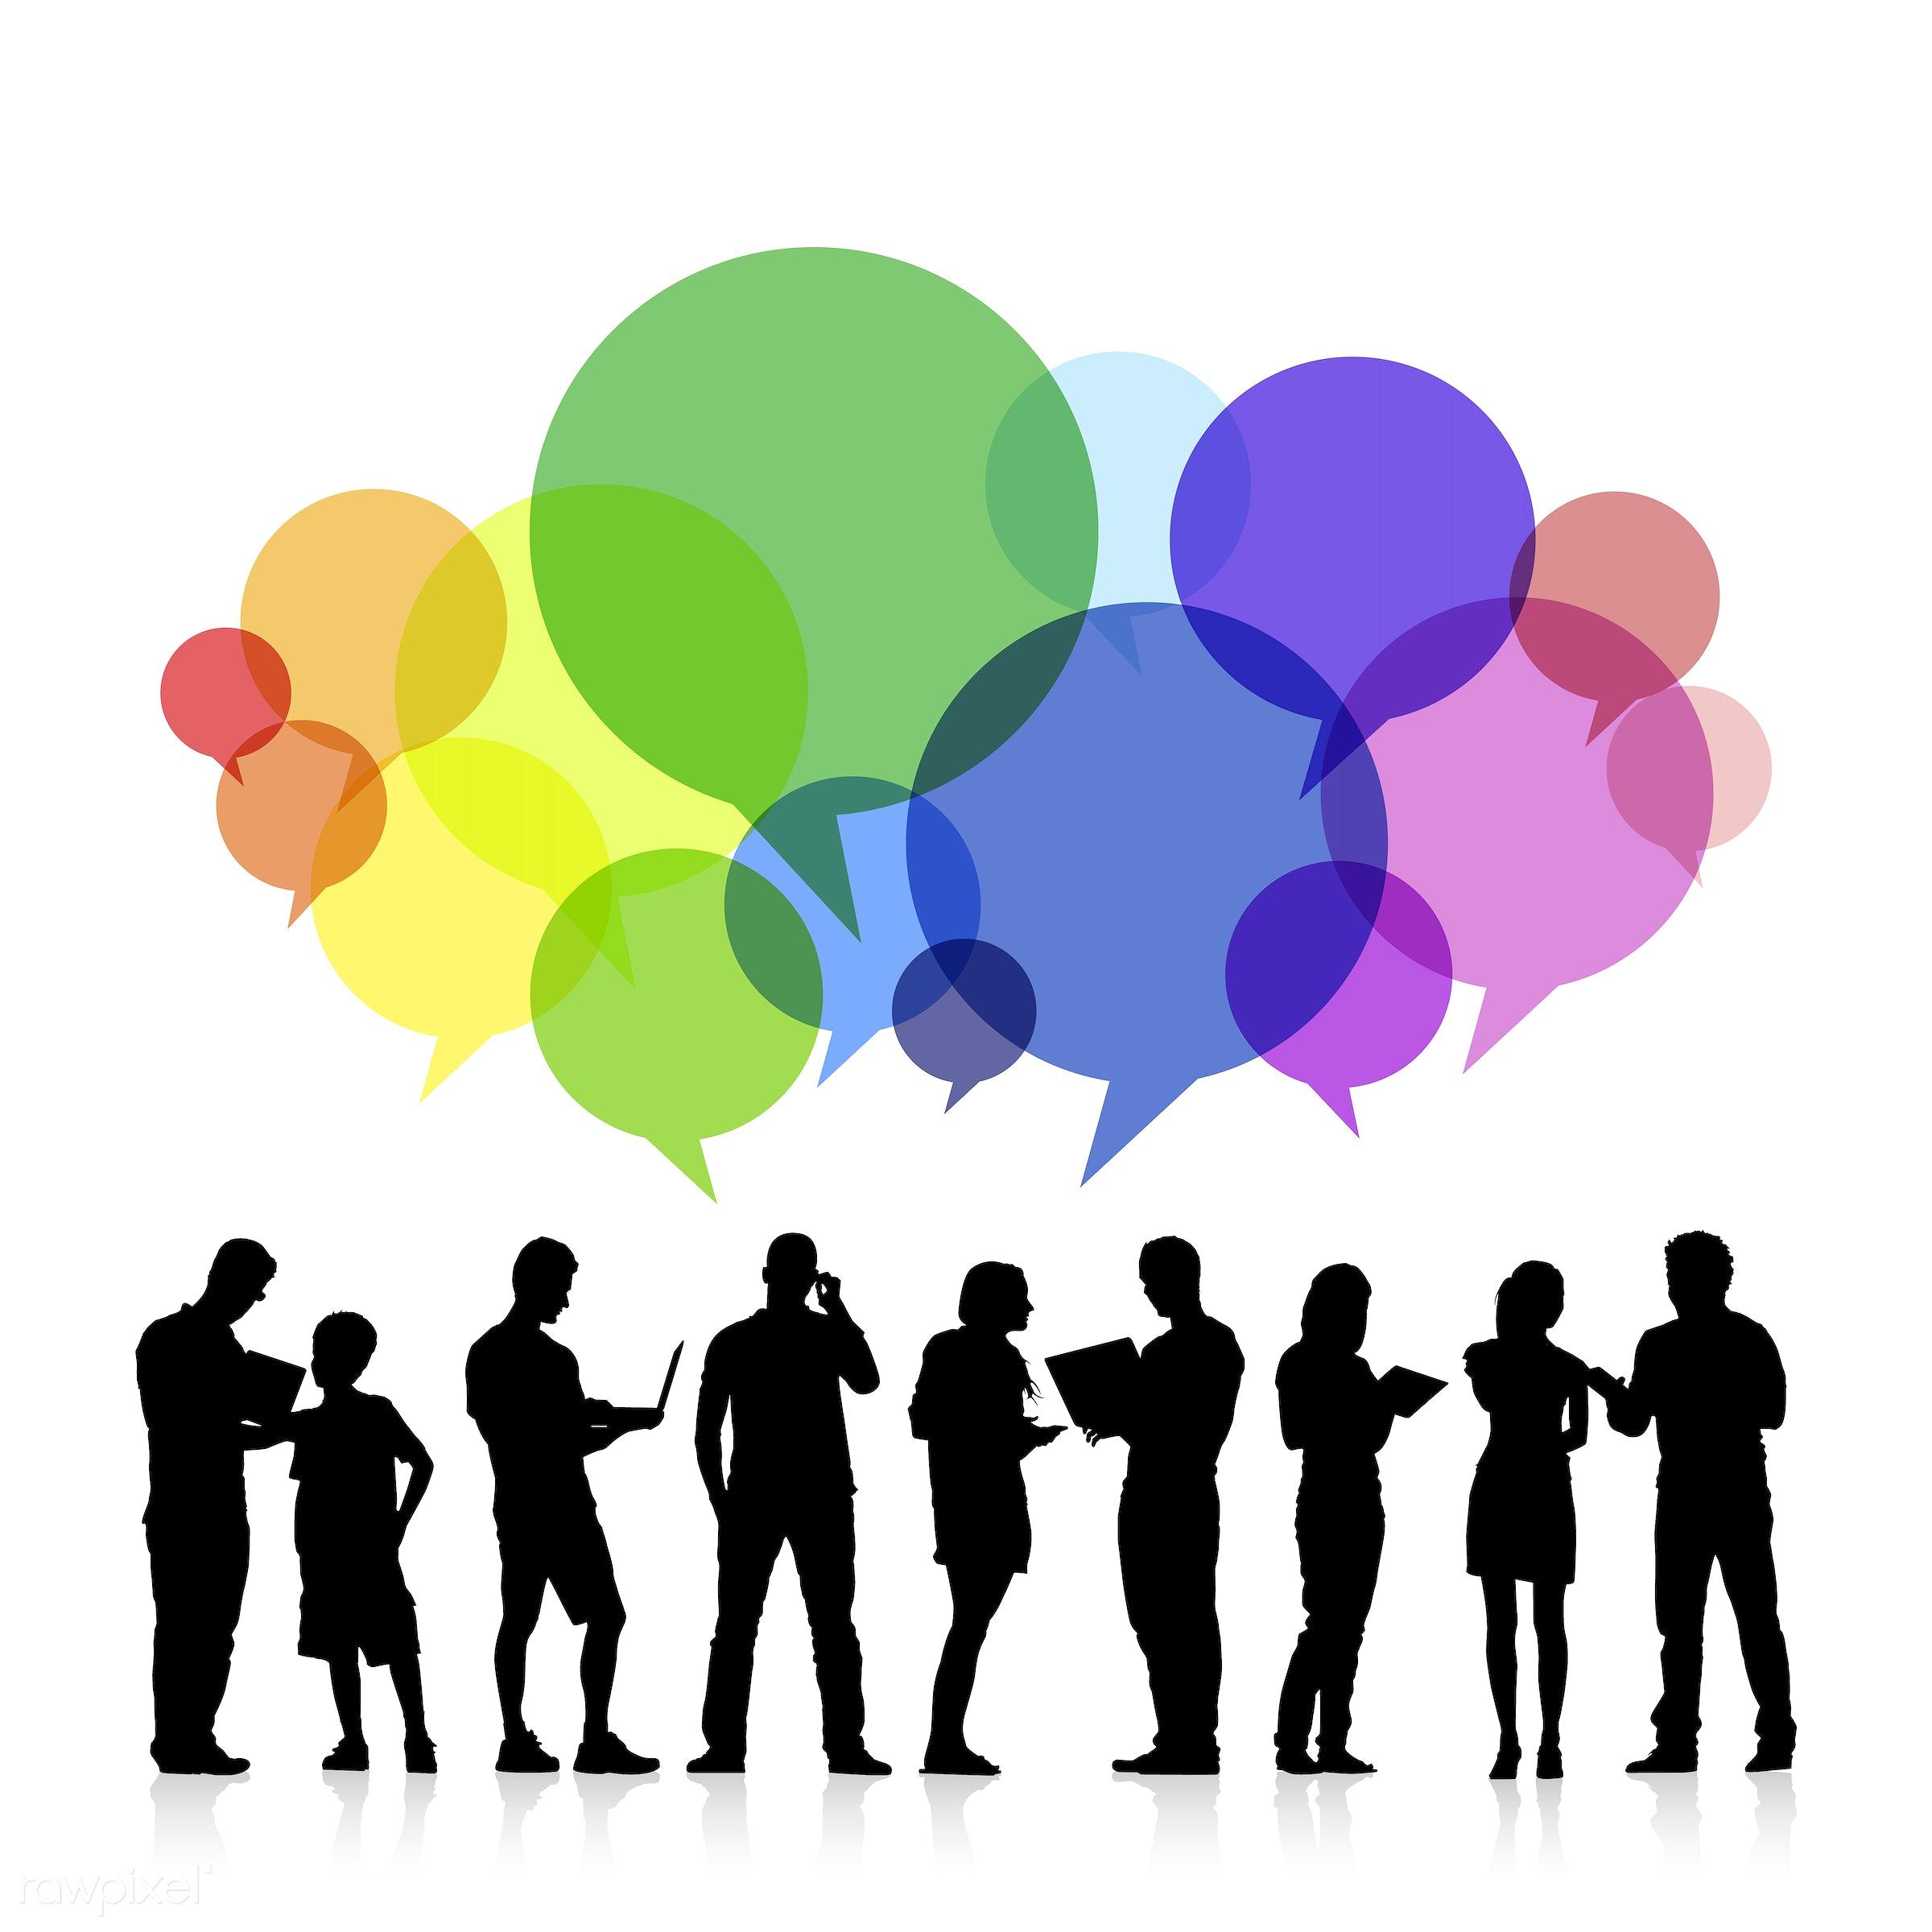 avatar, black, black silhouette, brainstorm, business, business meeting, collection, communication, conversation, creative,...